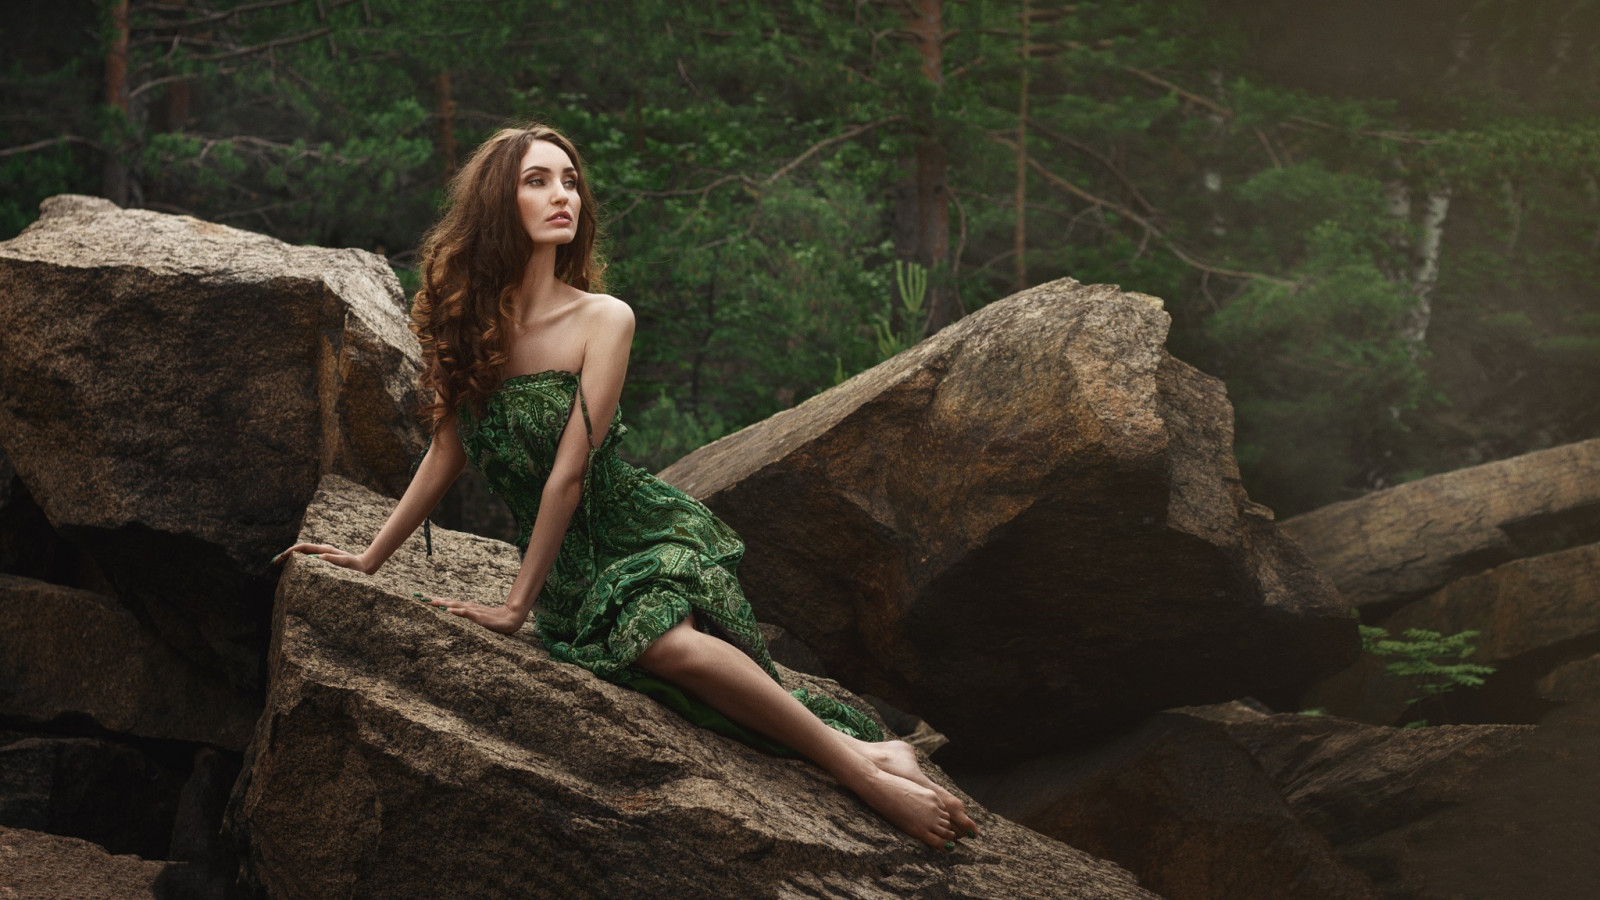 Brunette Girl Bent Wallpaper Fondos De Pantalla Bosque Mujer Modelo Rock